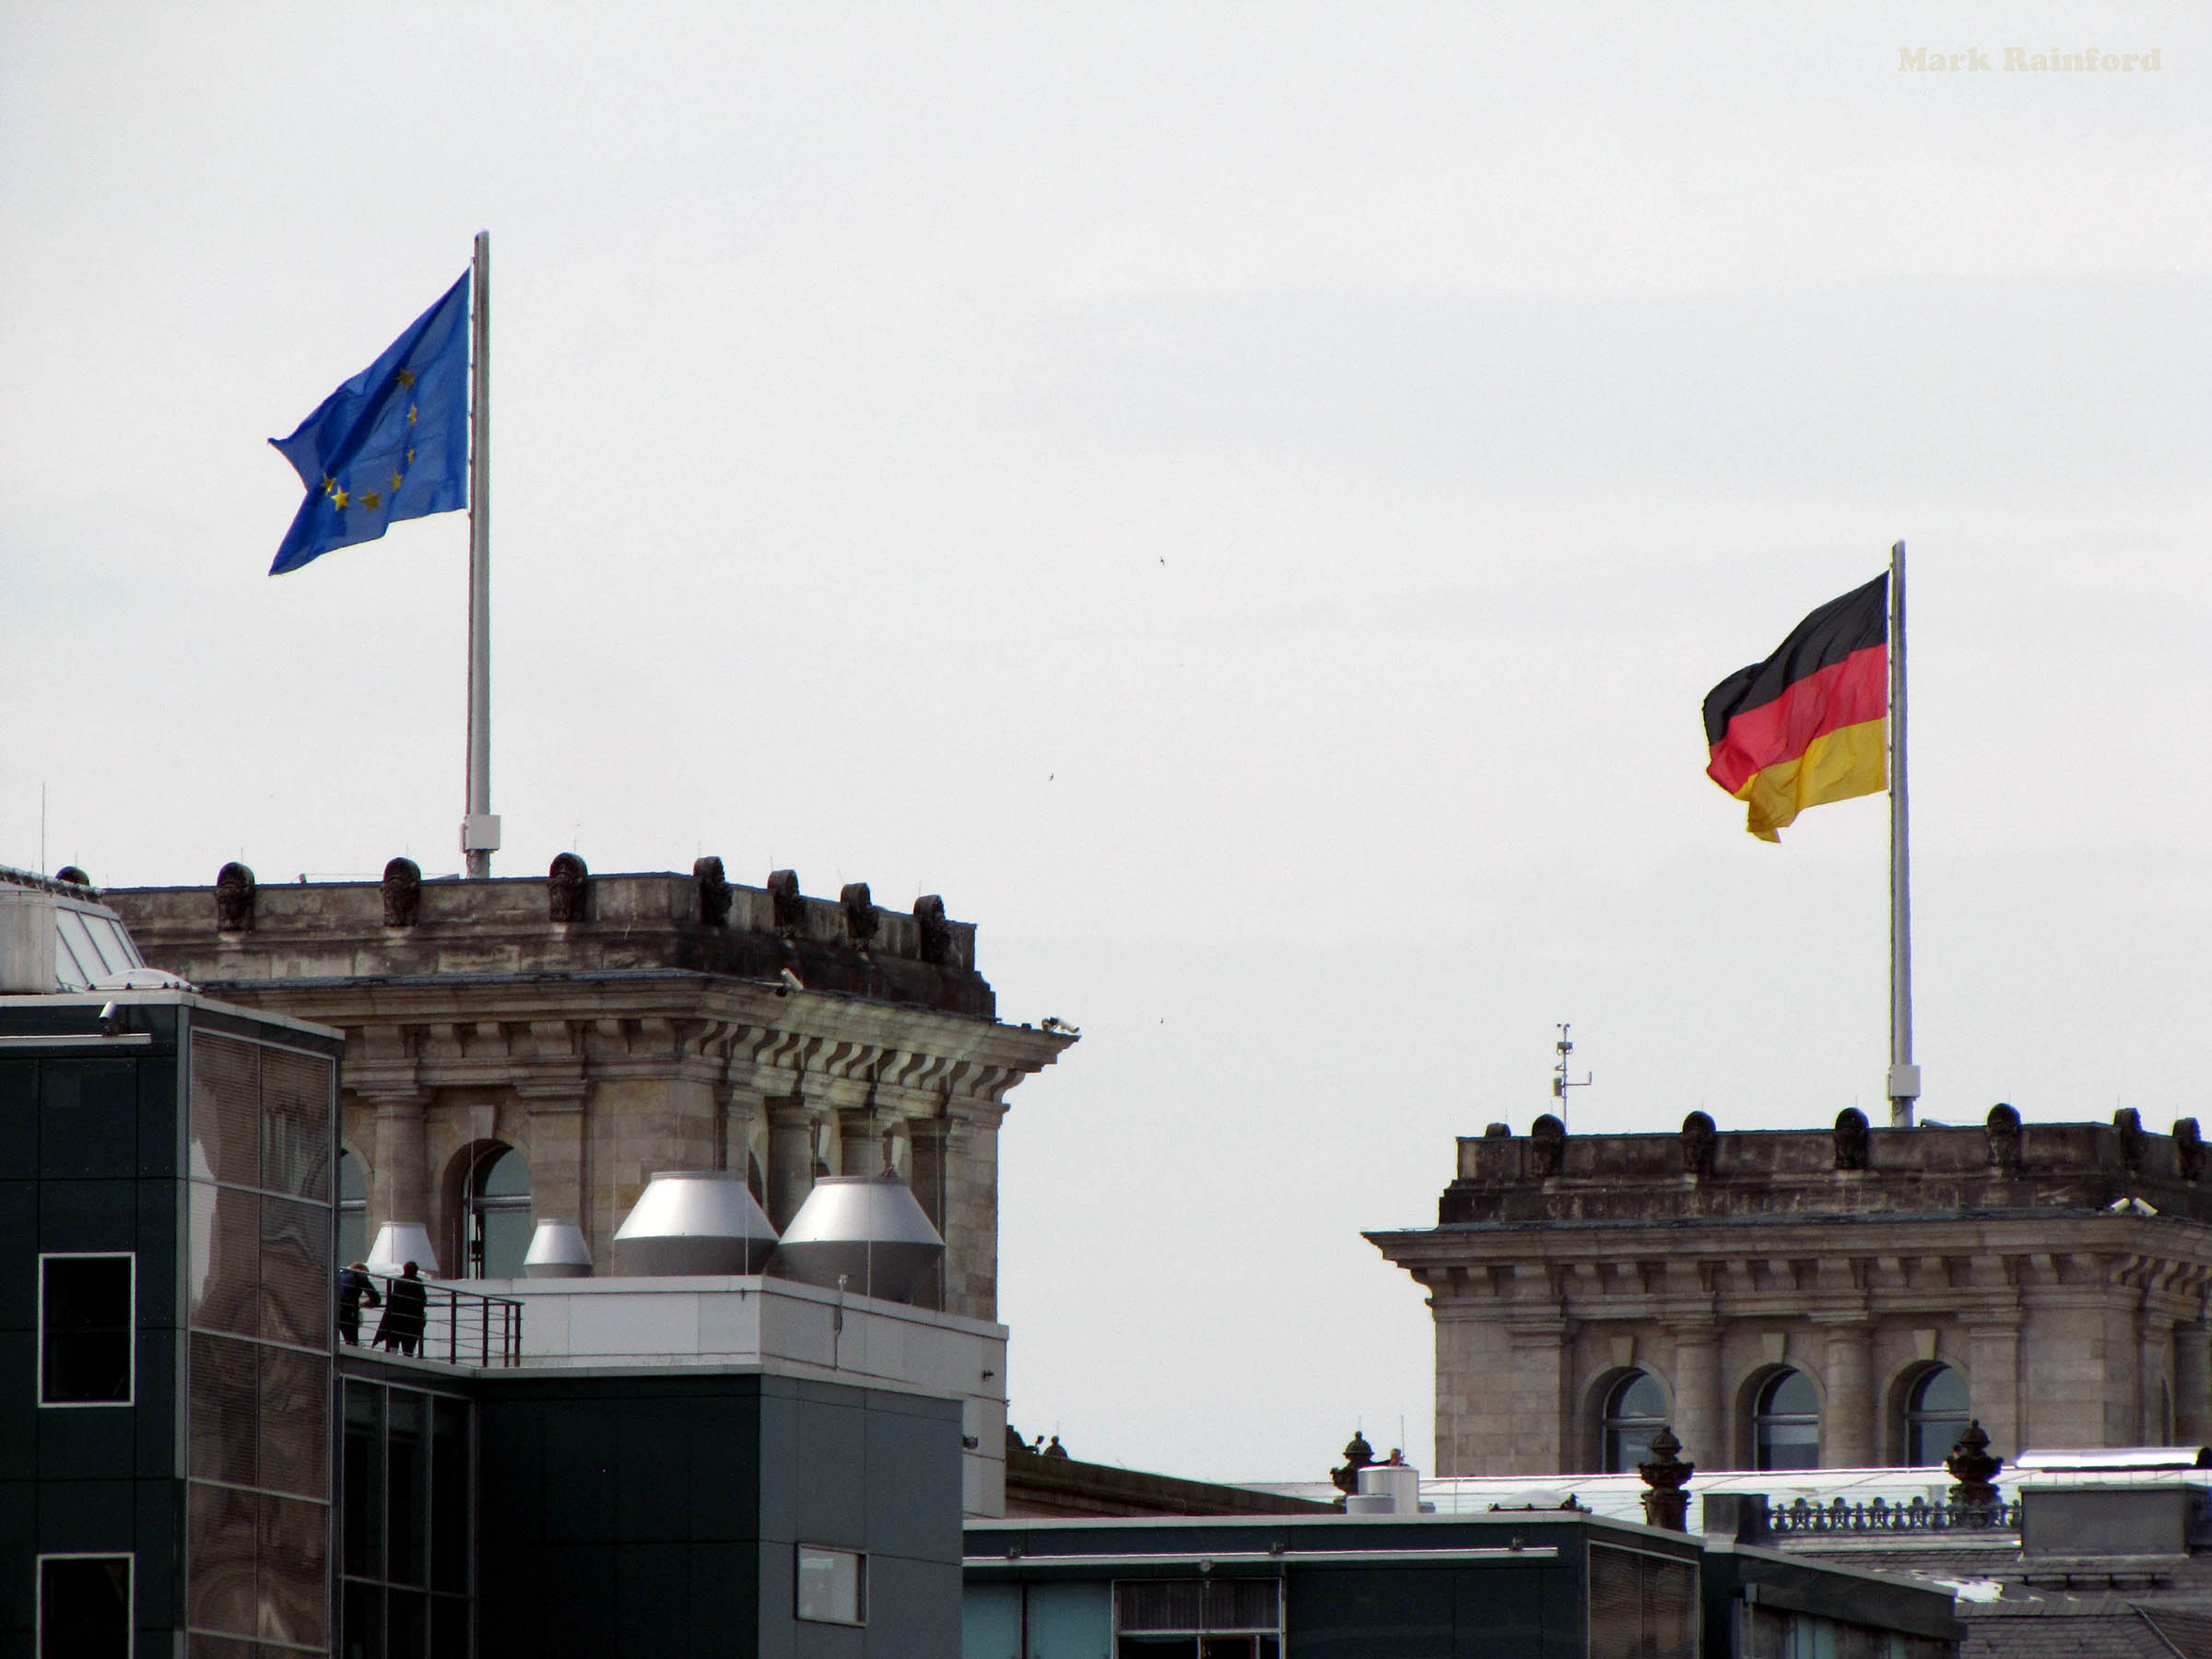 Berlin Germany Reichstag building